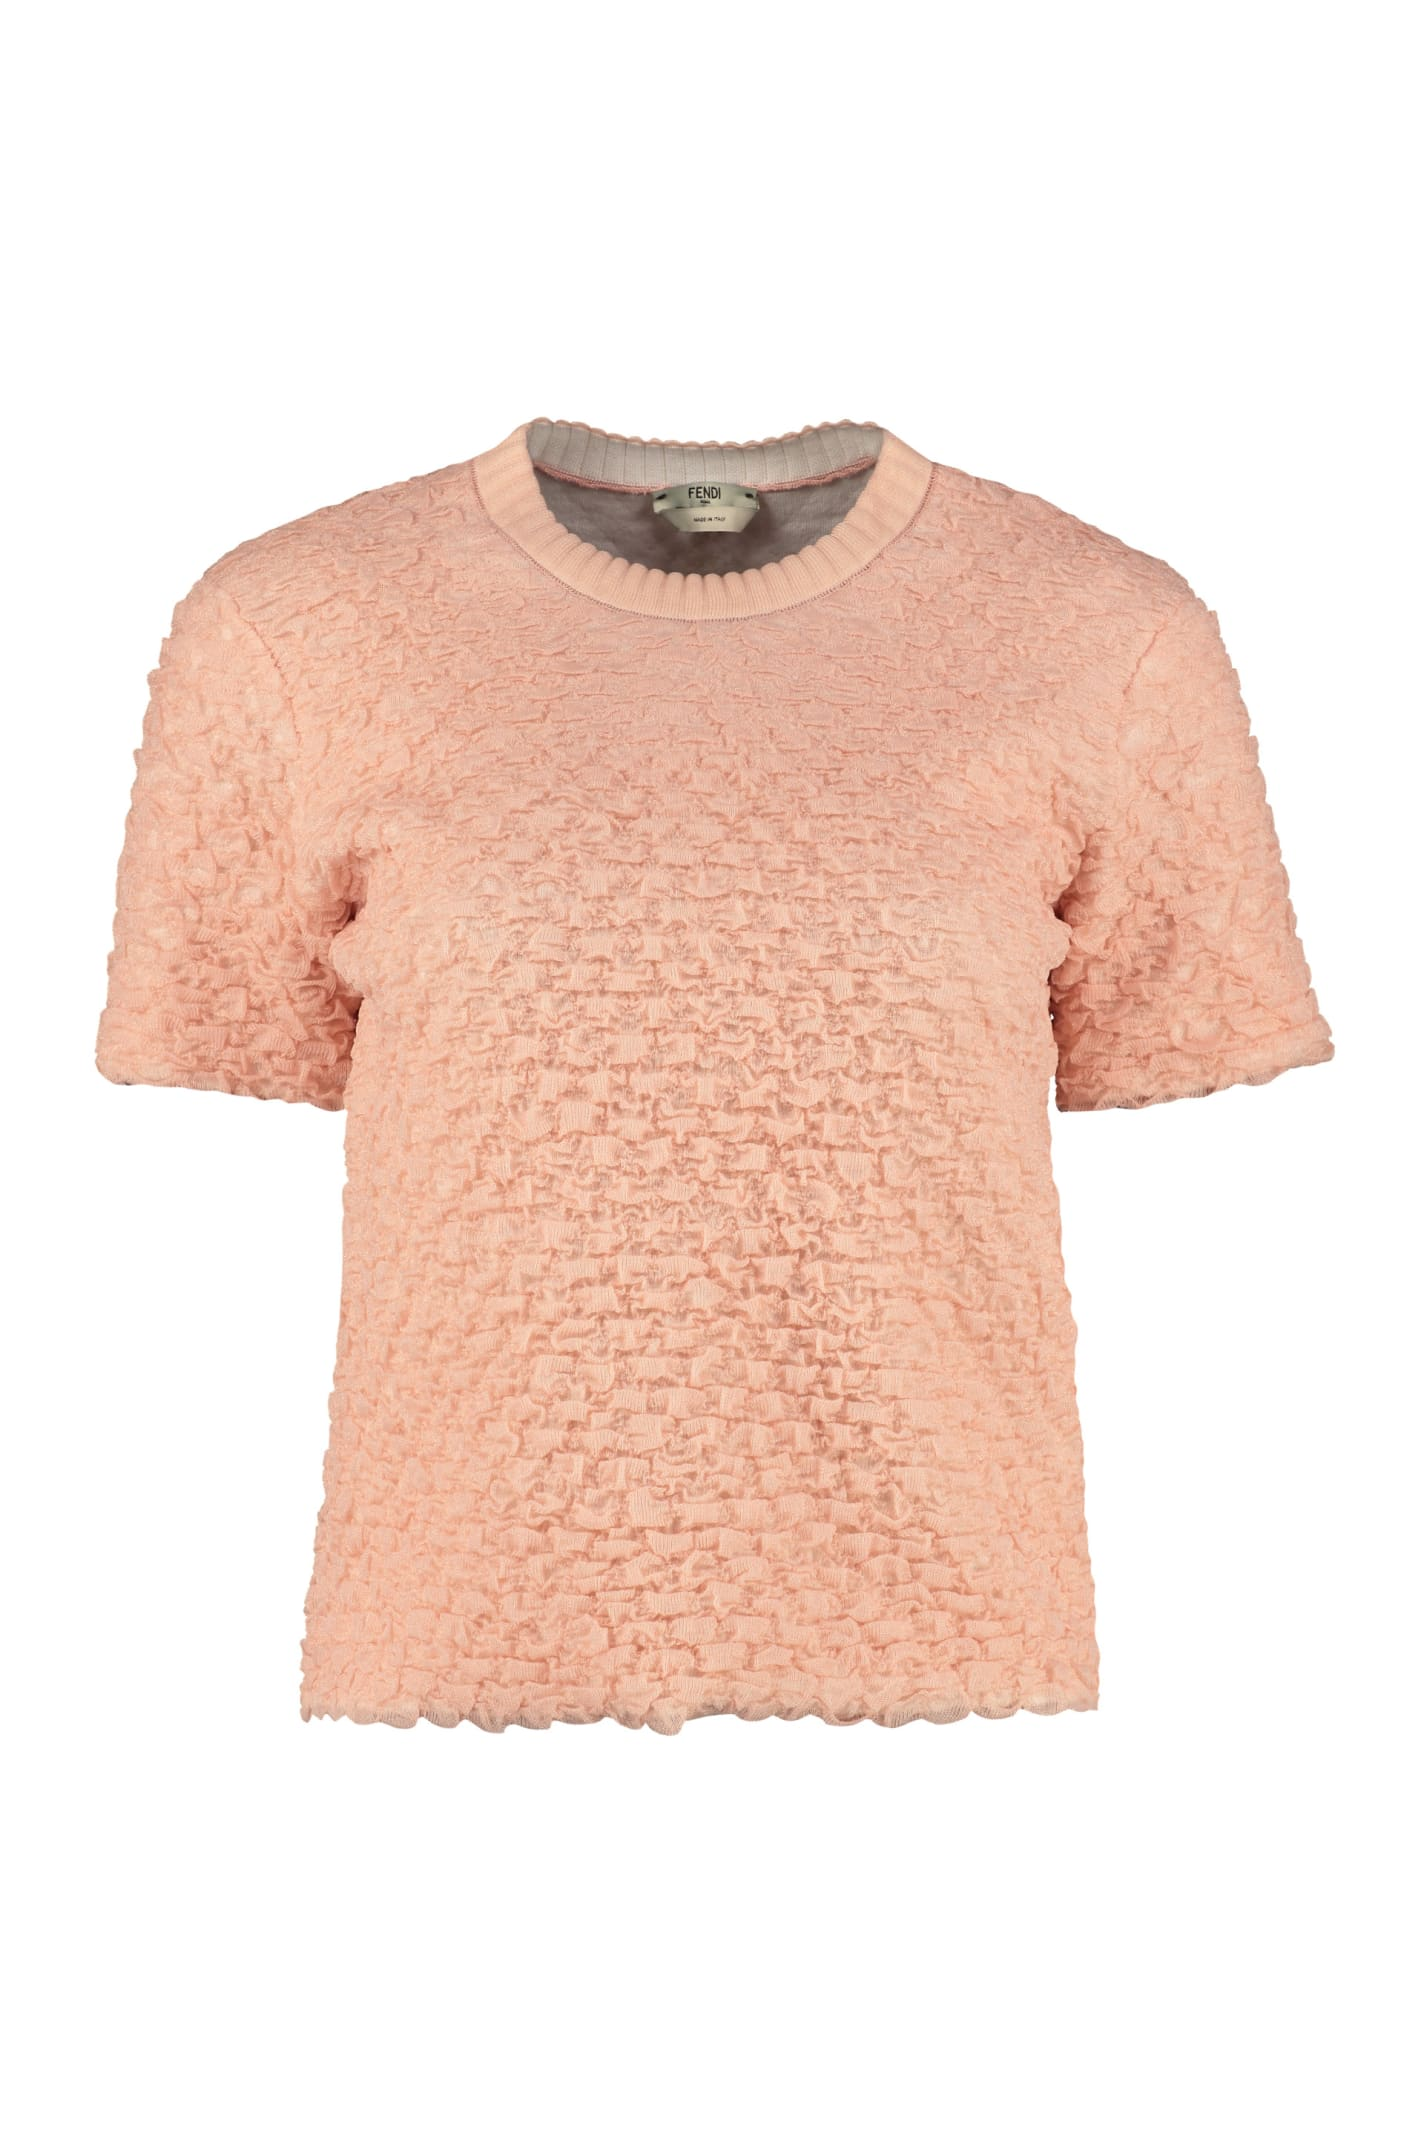 Fendi Embossed Knit Sweater